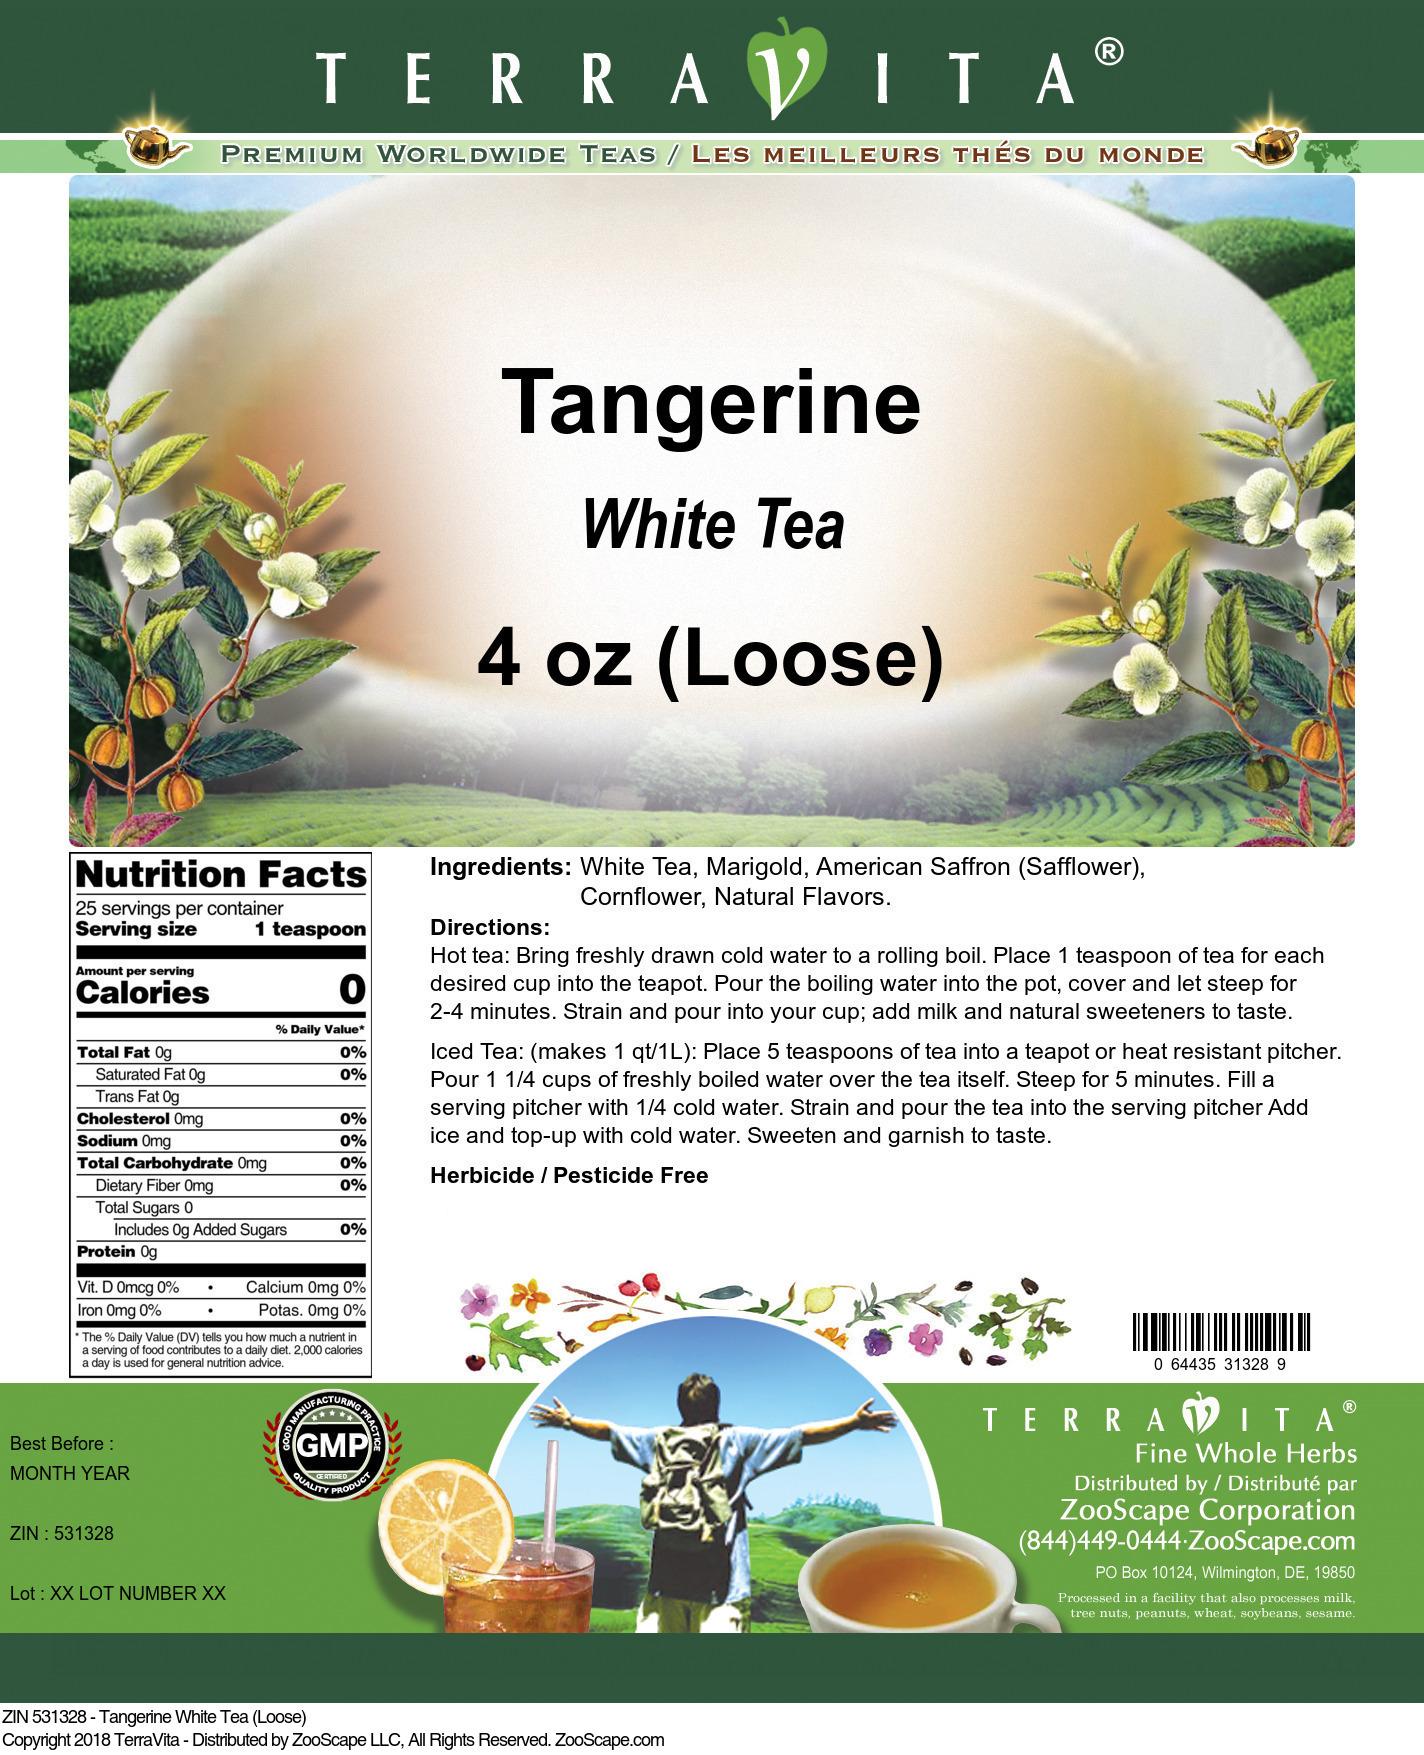 Tangerine White Tea (Loose)